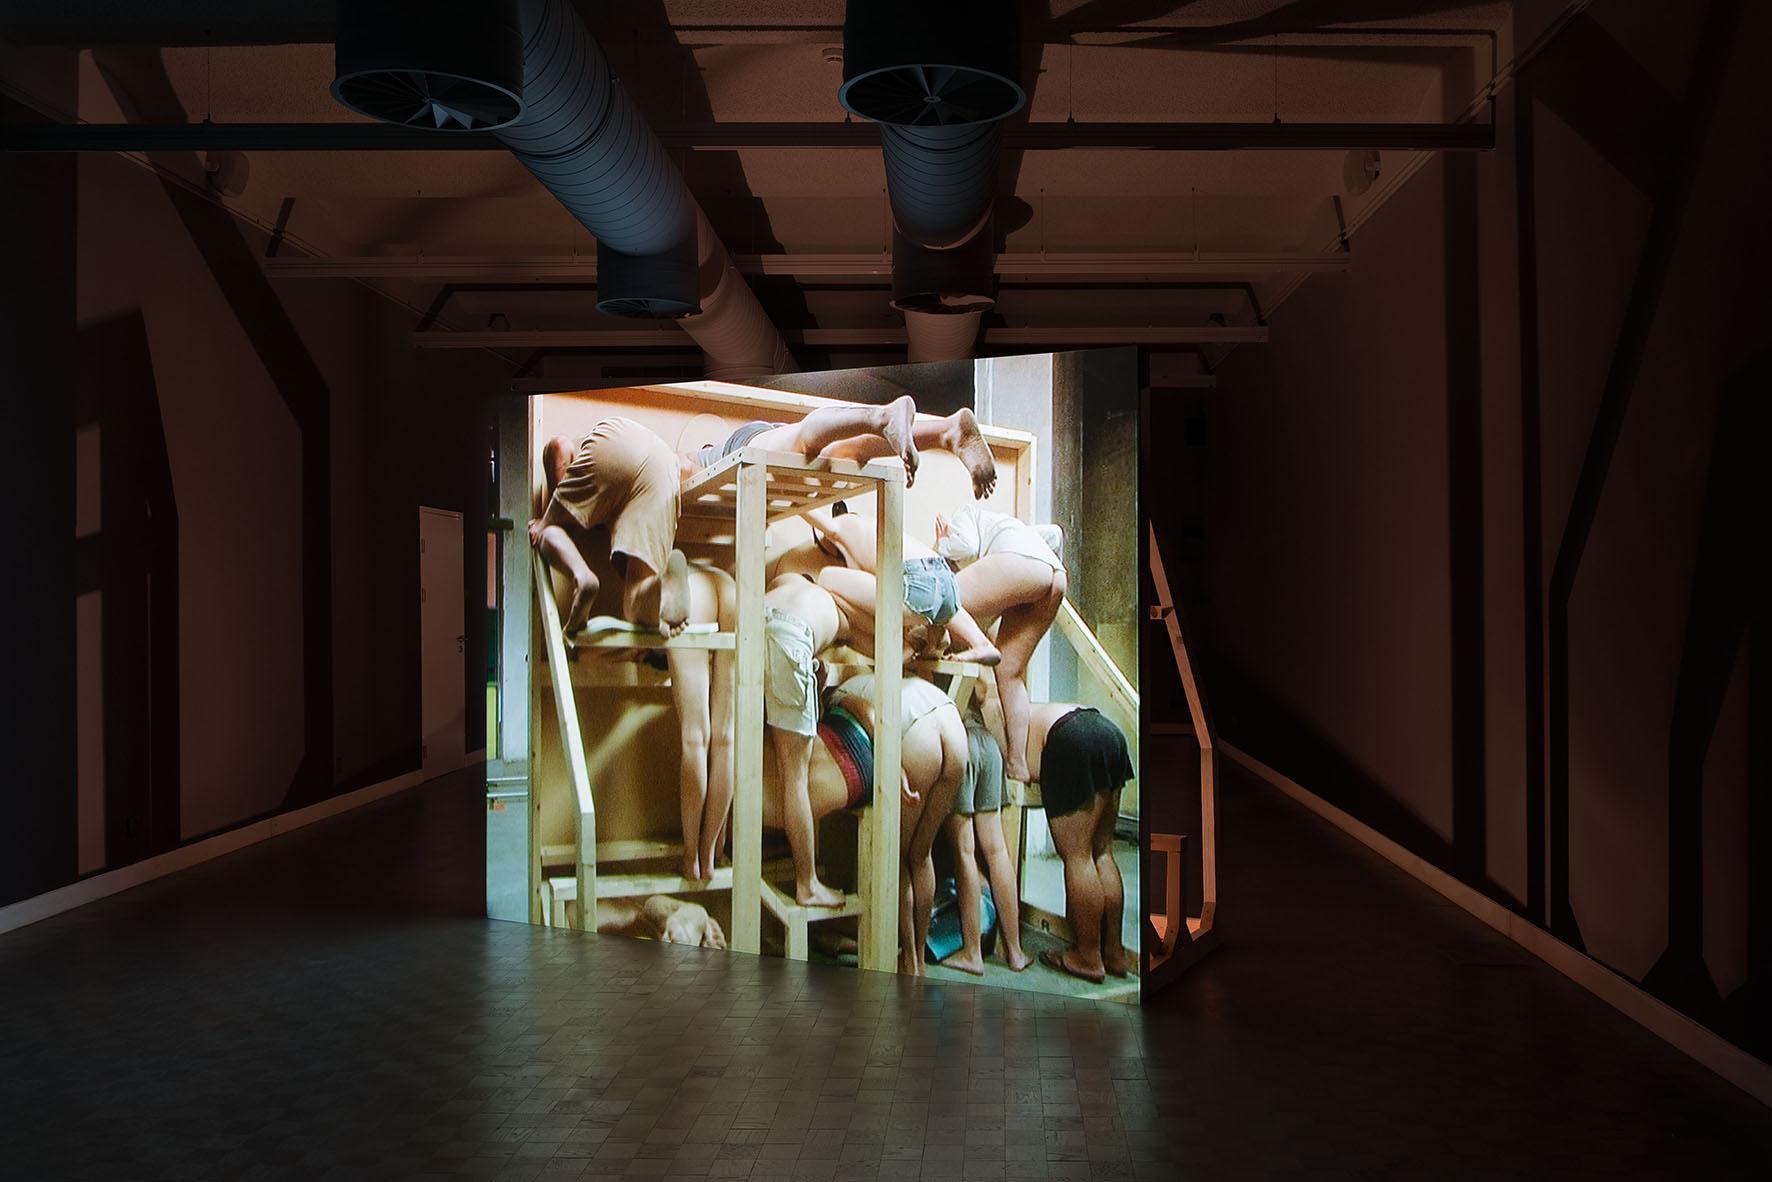 Gilad Ratman, Multipillory, instalacja